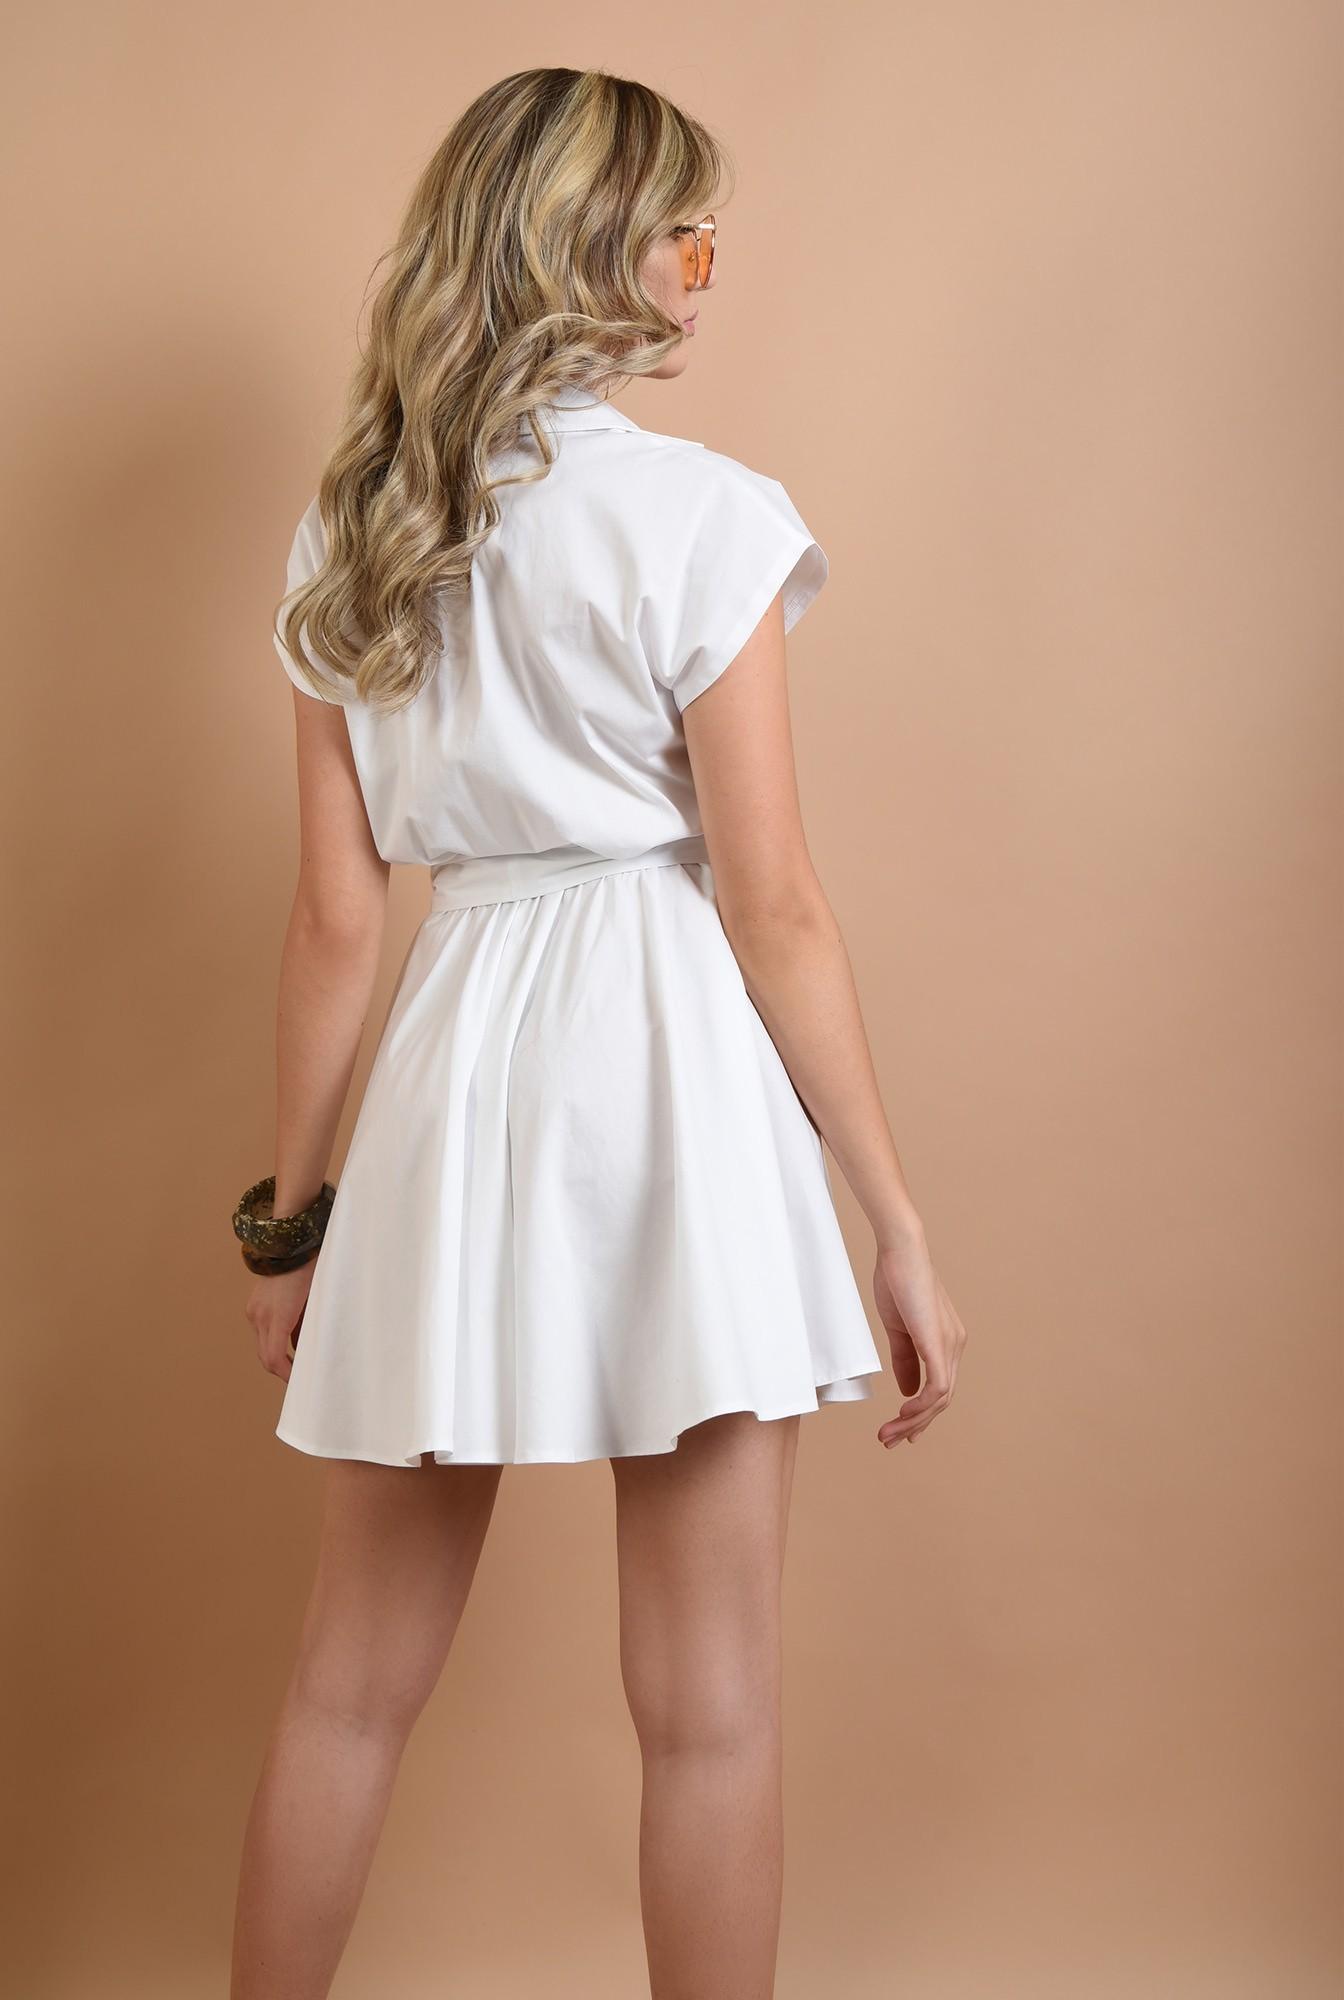 1 - 360 - rochie mini, evazata, fara maneci, cu cordon, alba